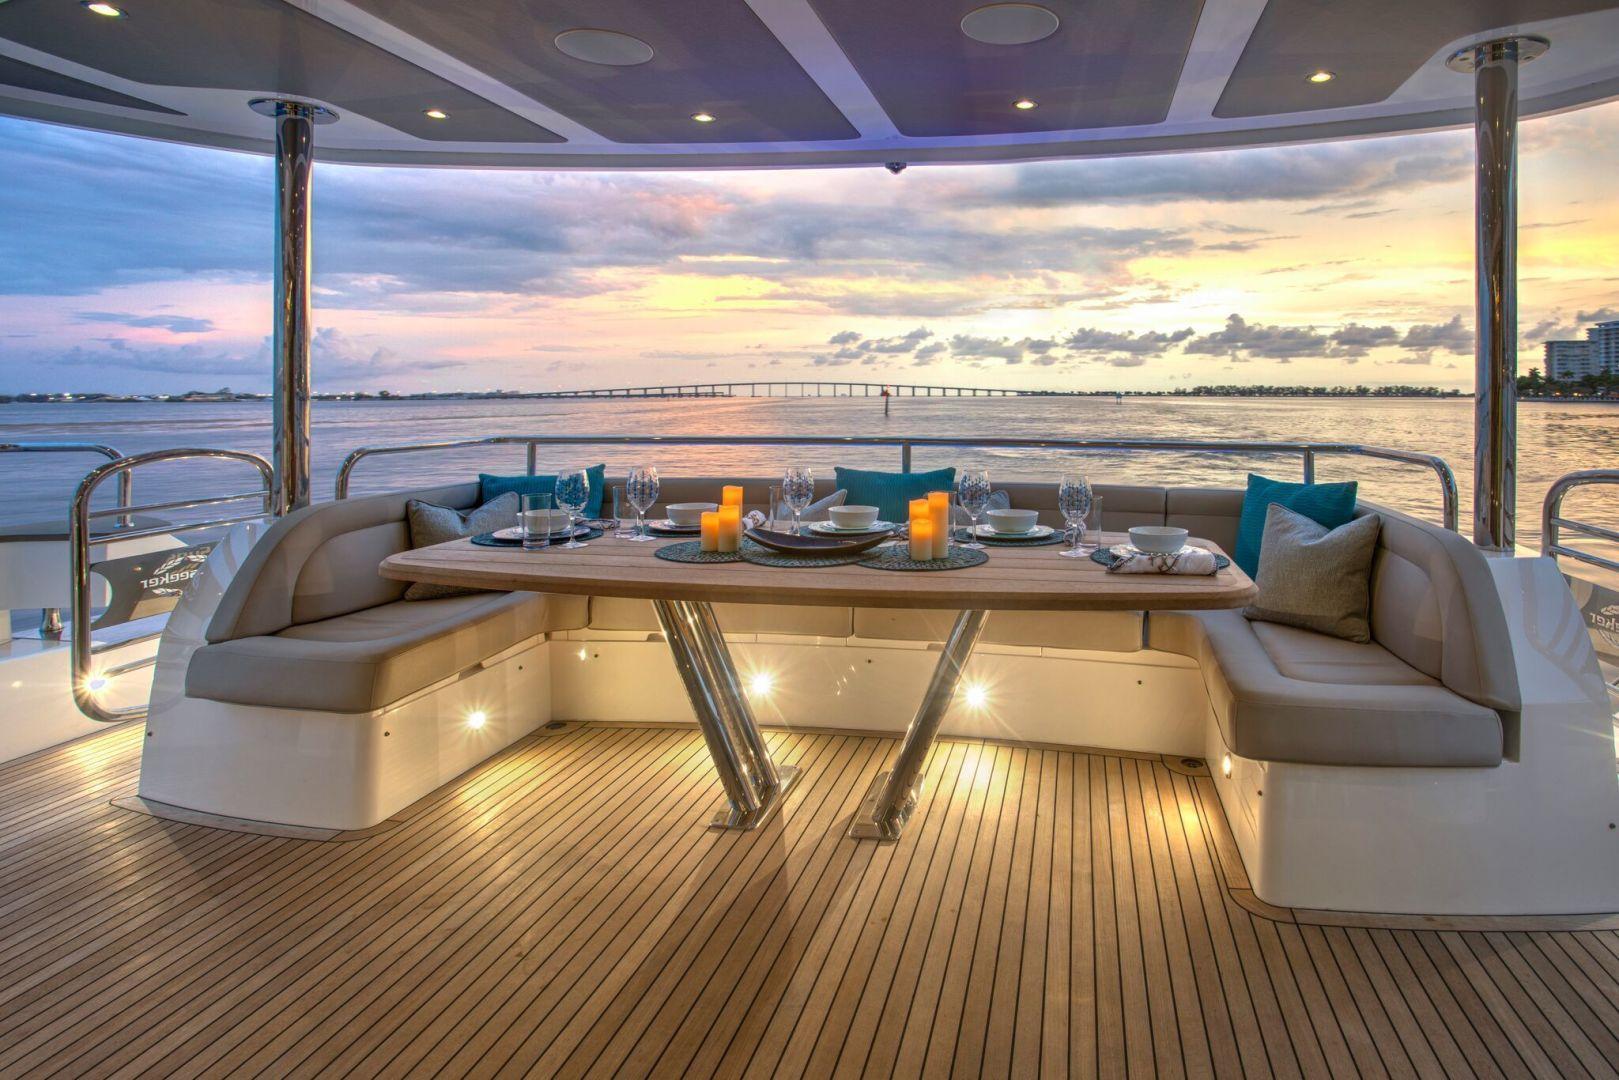 Sunseeker-95 Yacht 2017-Perseverance 3 Ft Lauderdale-Florida-United States-1400074   Thumbnail